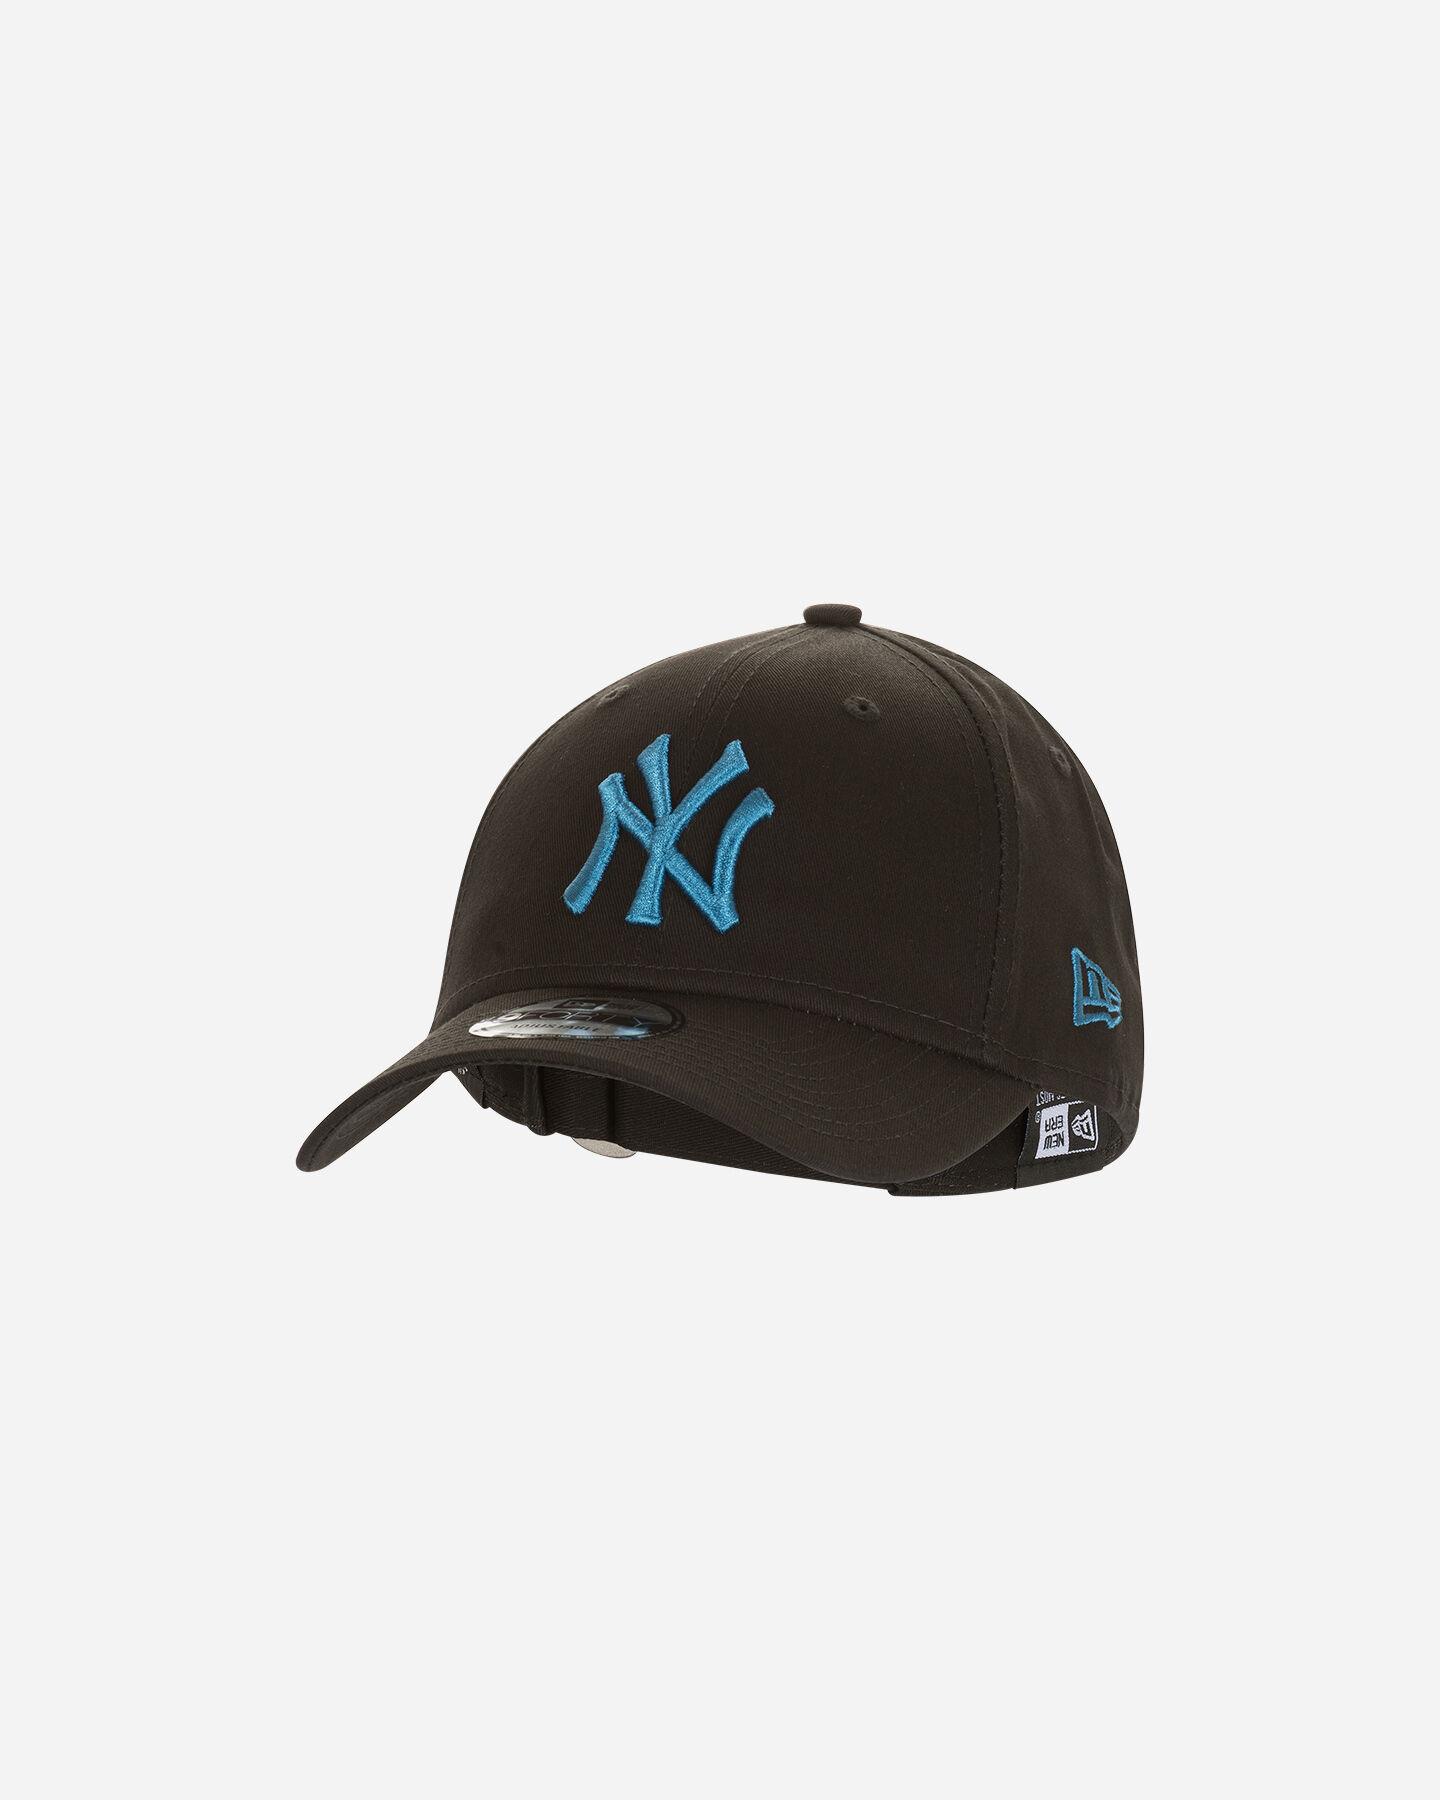 Cappellino NEW ERA 9FORTY NEW YORK YANKEES  S5239032 001 OSFM scatto 0